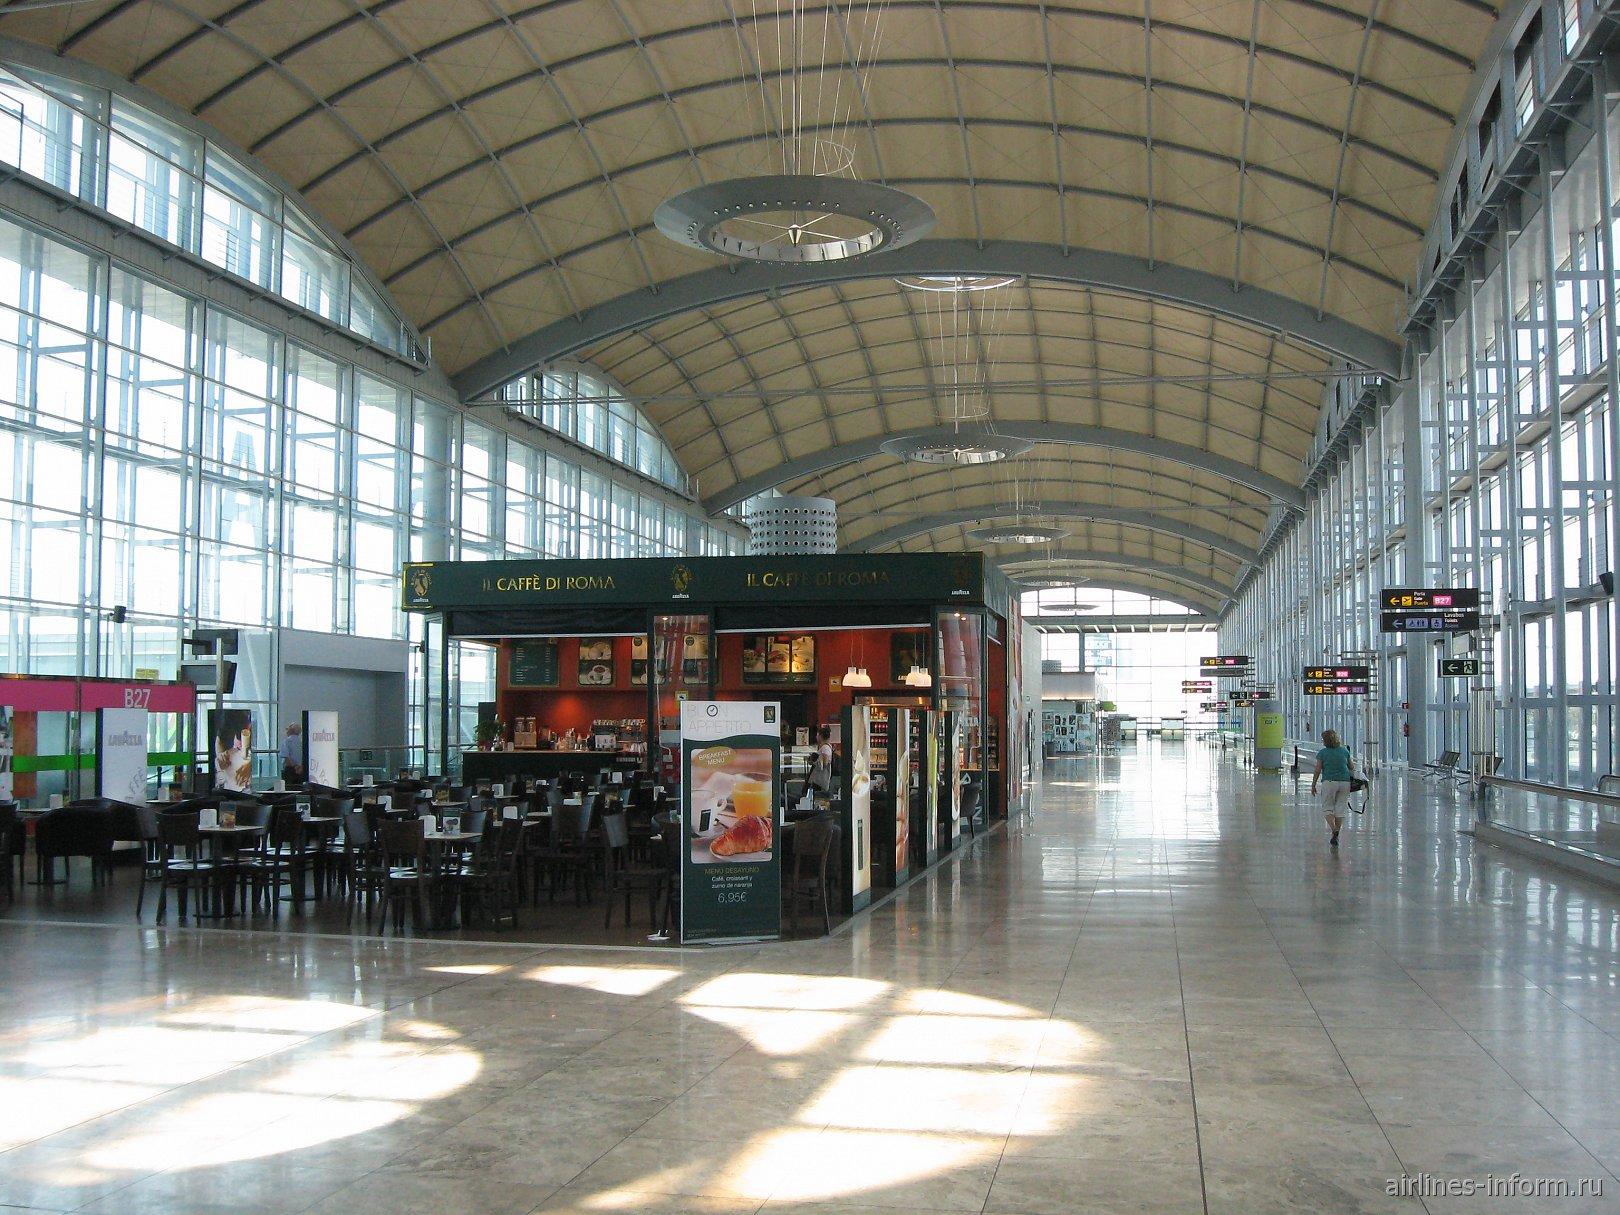 Галерея выходов на посадку в аэропорту Аликанте